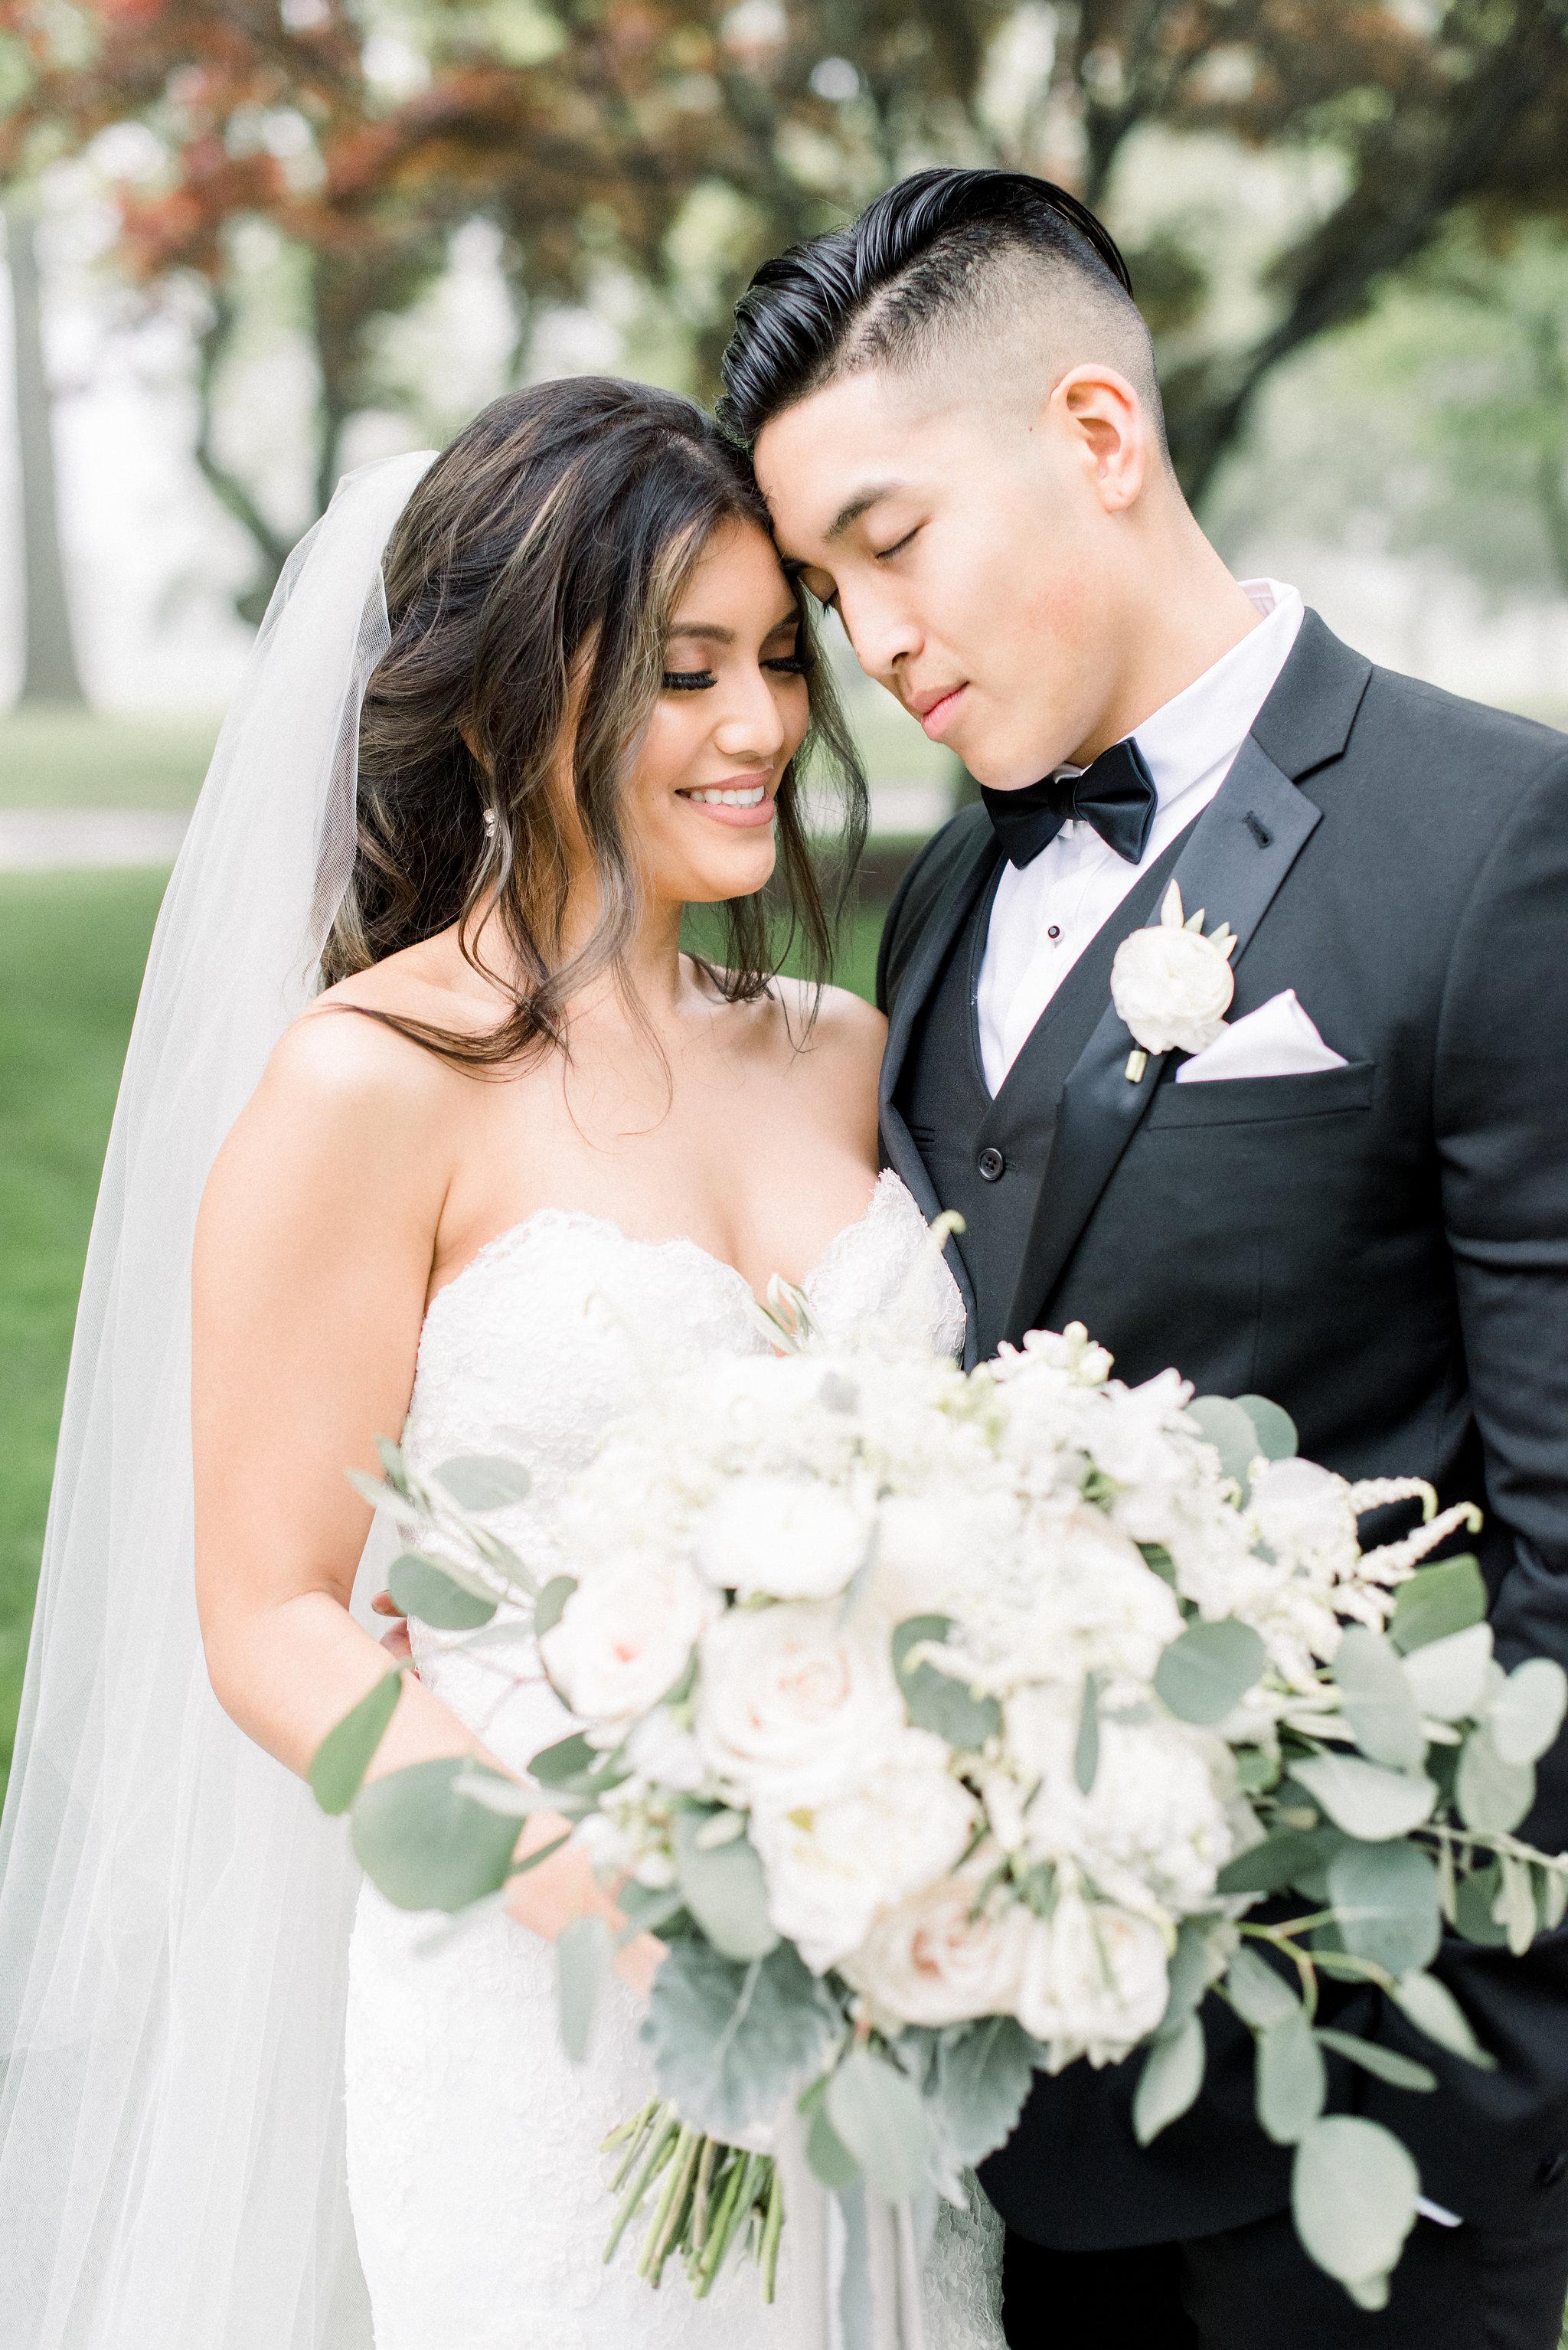 Best wedding planners in Philadelphia